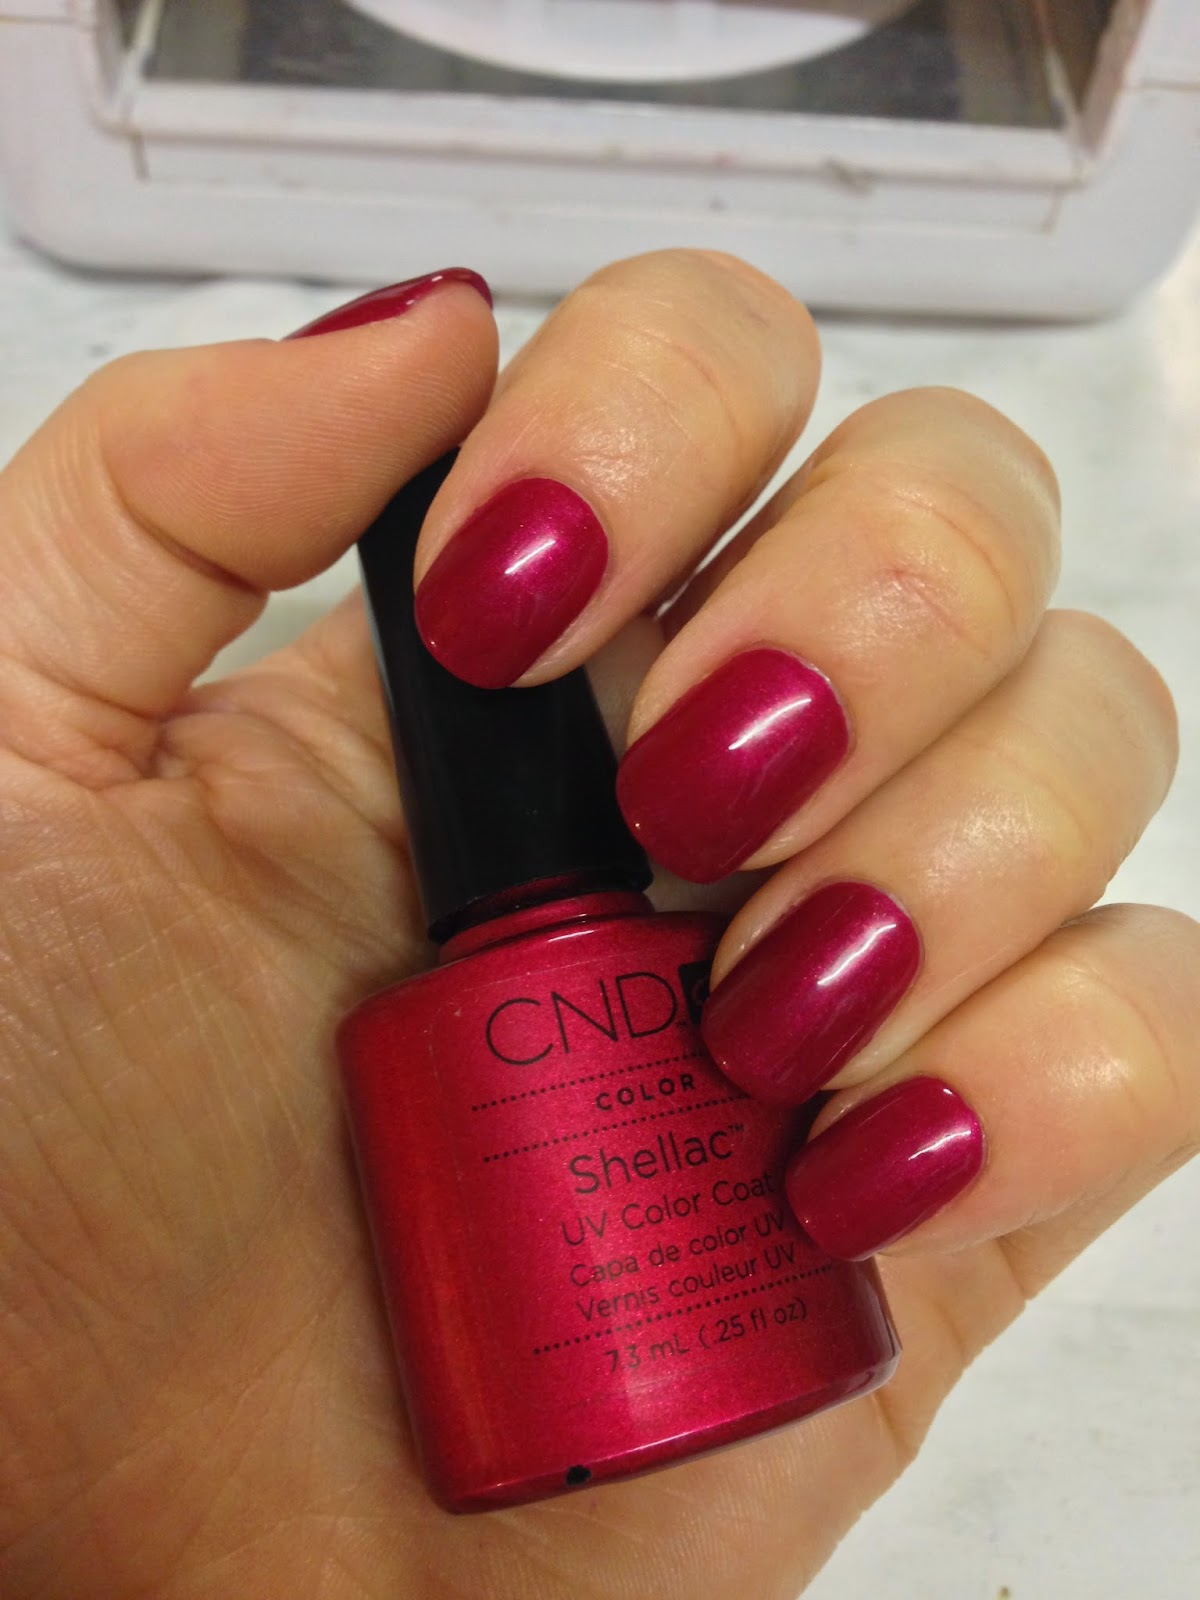 Cnd Creative Play Nail Lacquer Reviews In Nail Polish: Brush Up And Polish Up!: CND Shellac Red Baroness